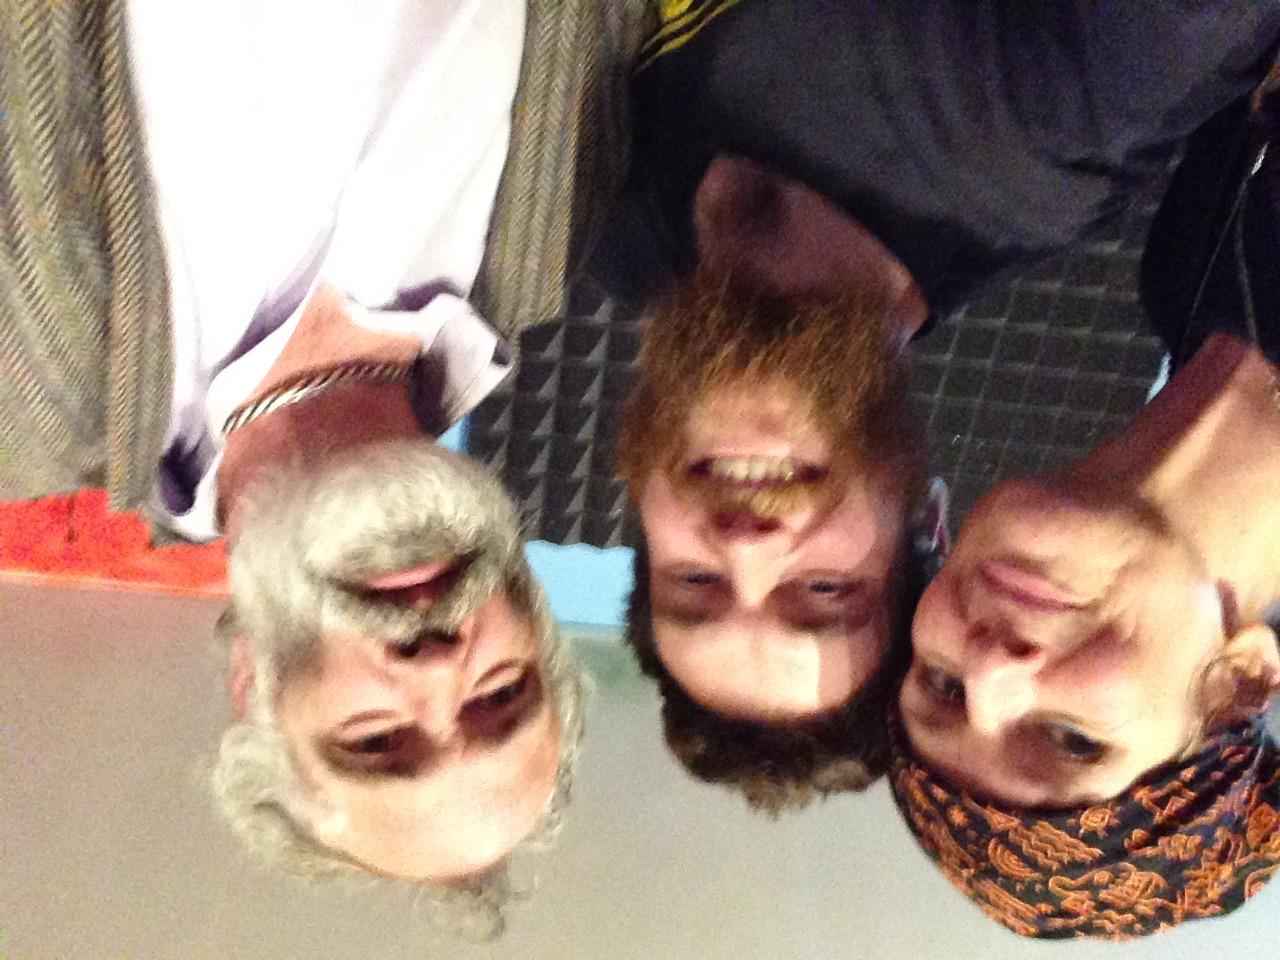 Me, Mick and Ronan2